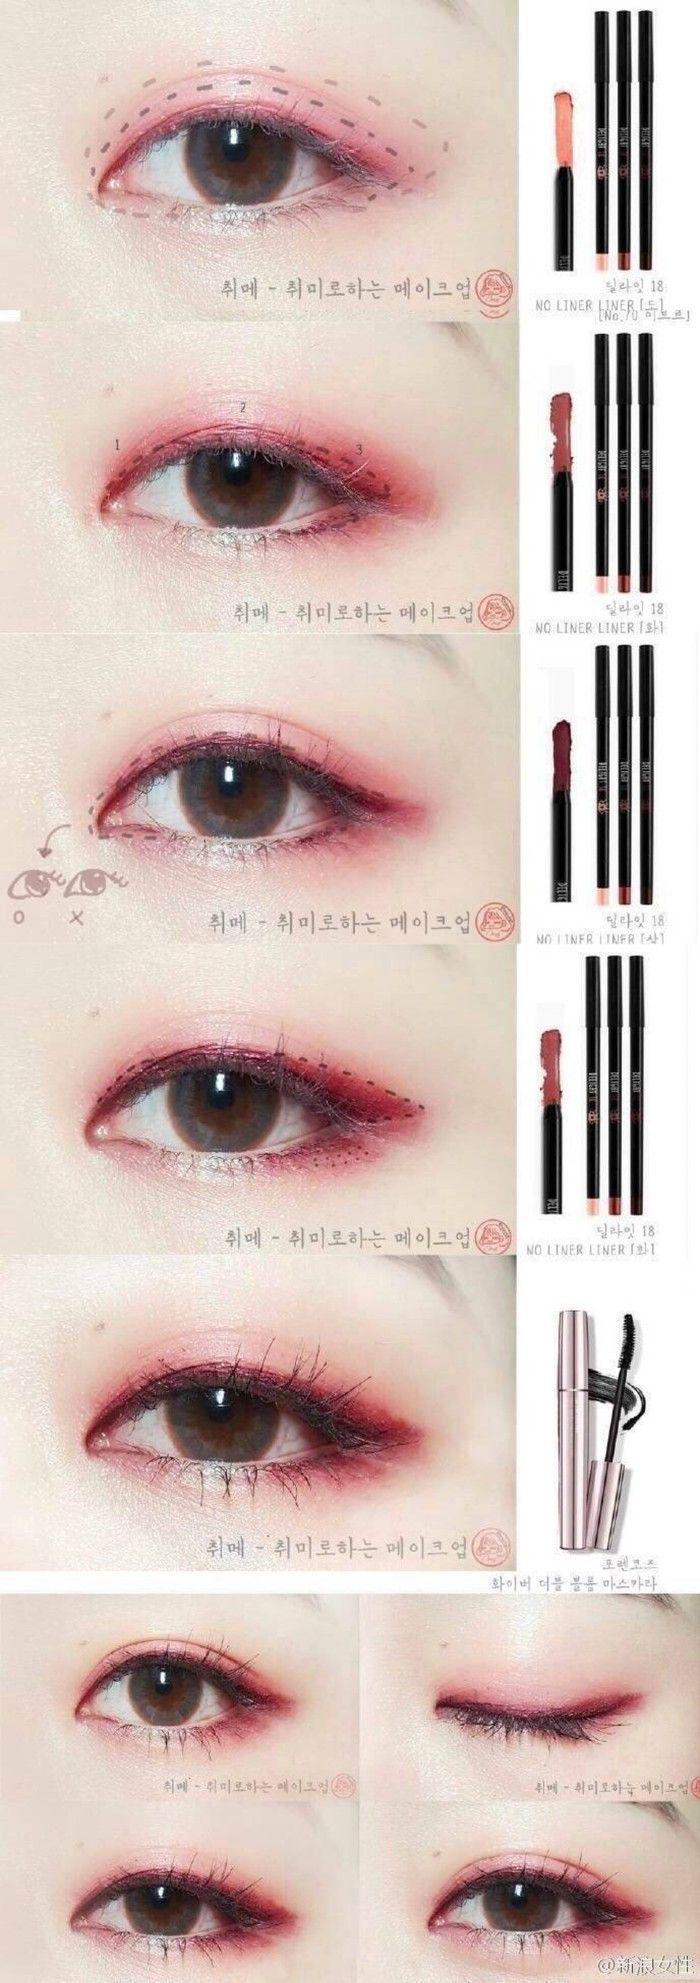 How To Apply Liquid Lipstick Like A PRO!